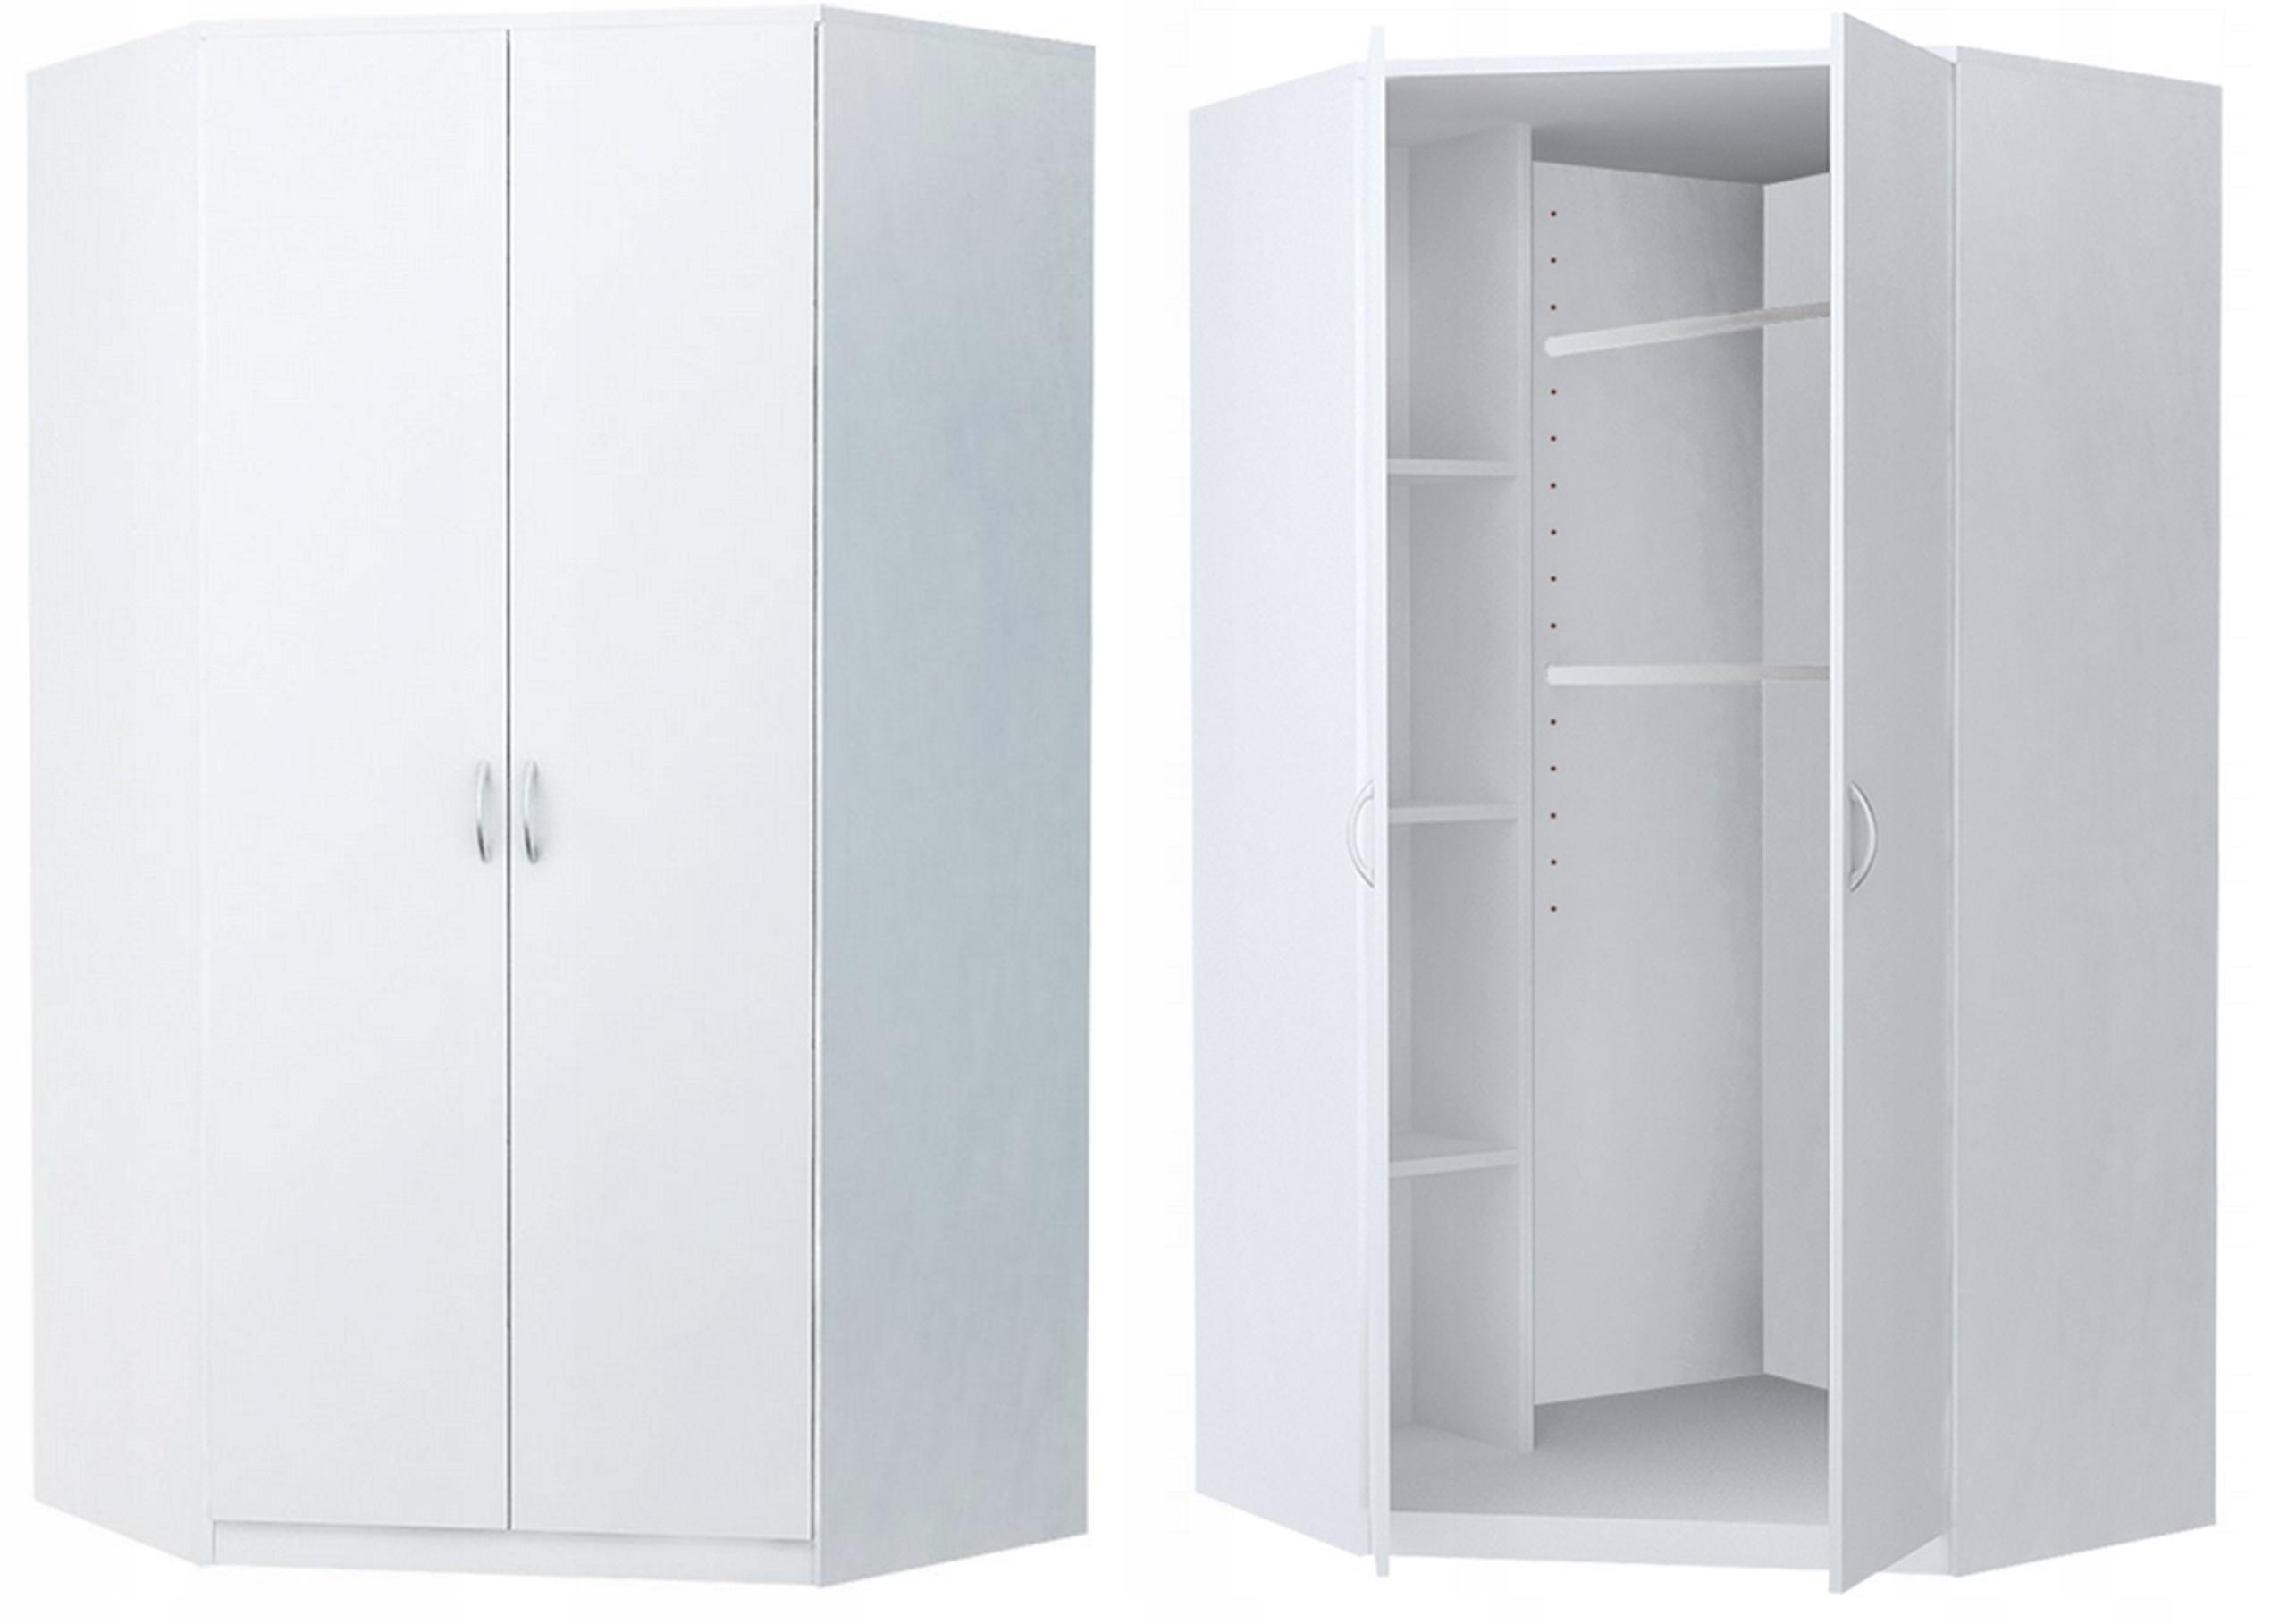 Гардероб угловой шкаф CORNER 2D WHITE комод книжный шкаф